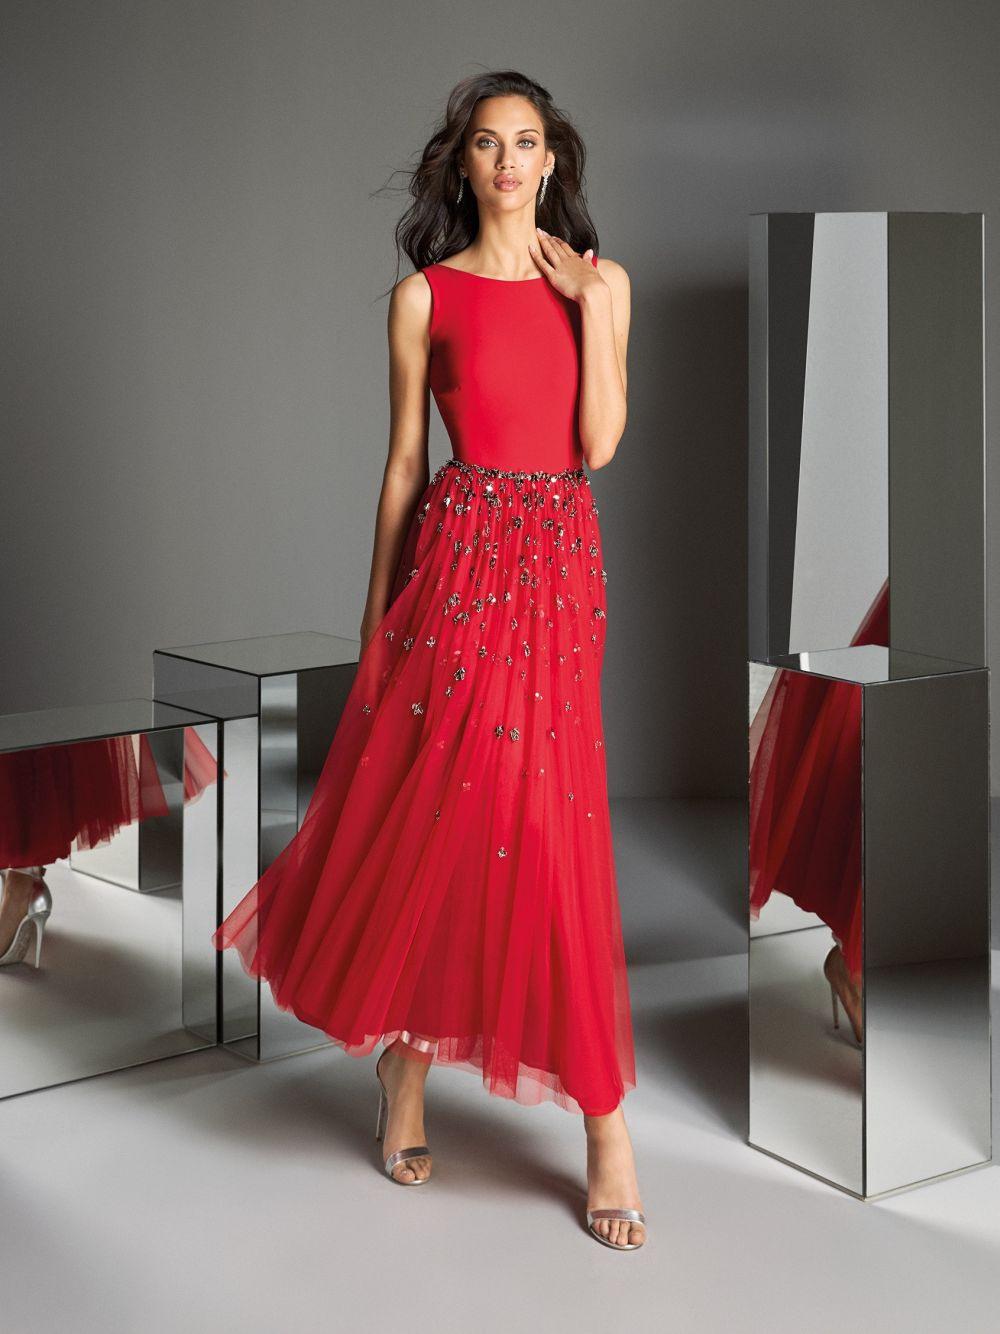 20 Coolste Abend Kleider Hannover StylishAbend Ausgezeichnet Abend Kleider Hannover Galerie